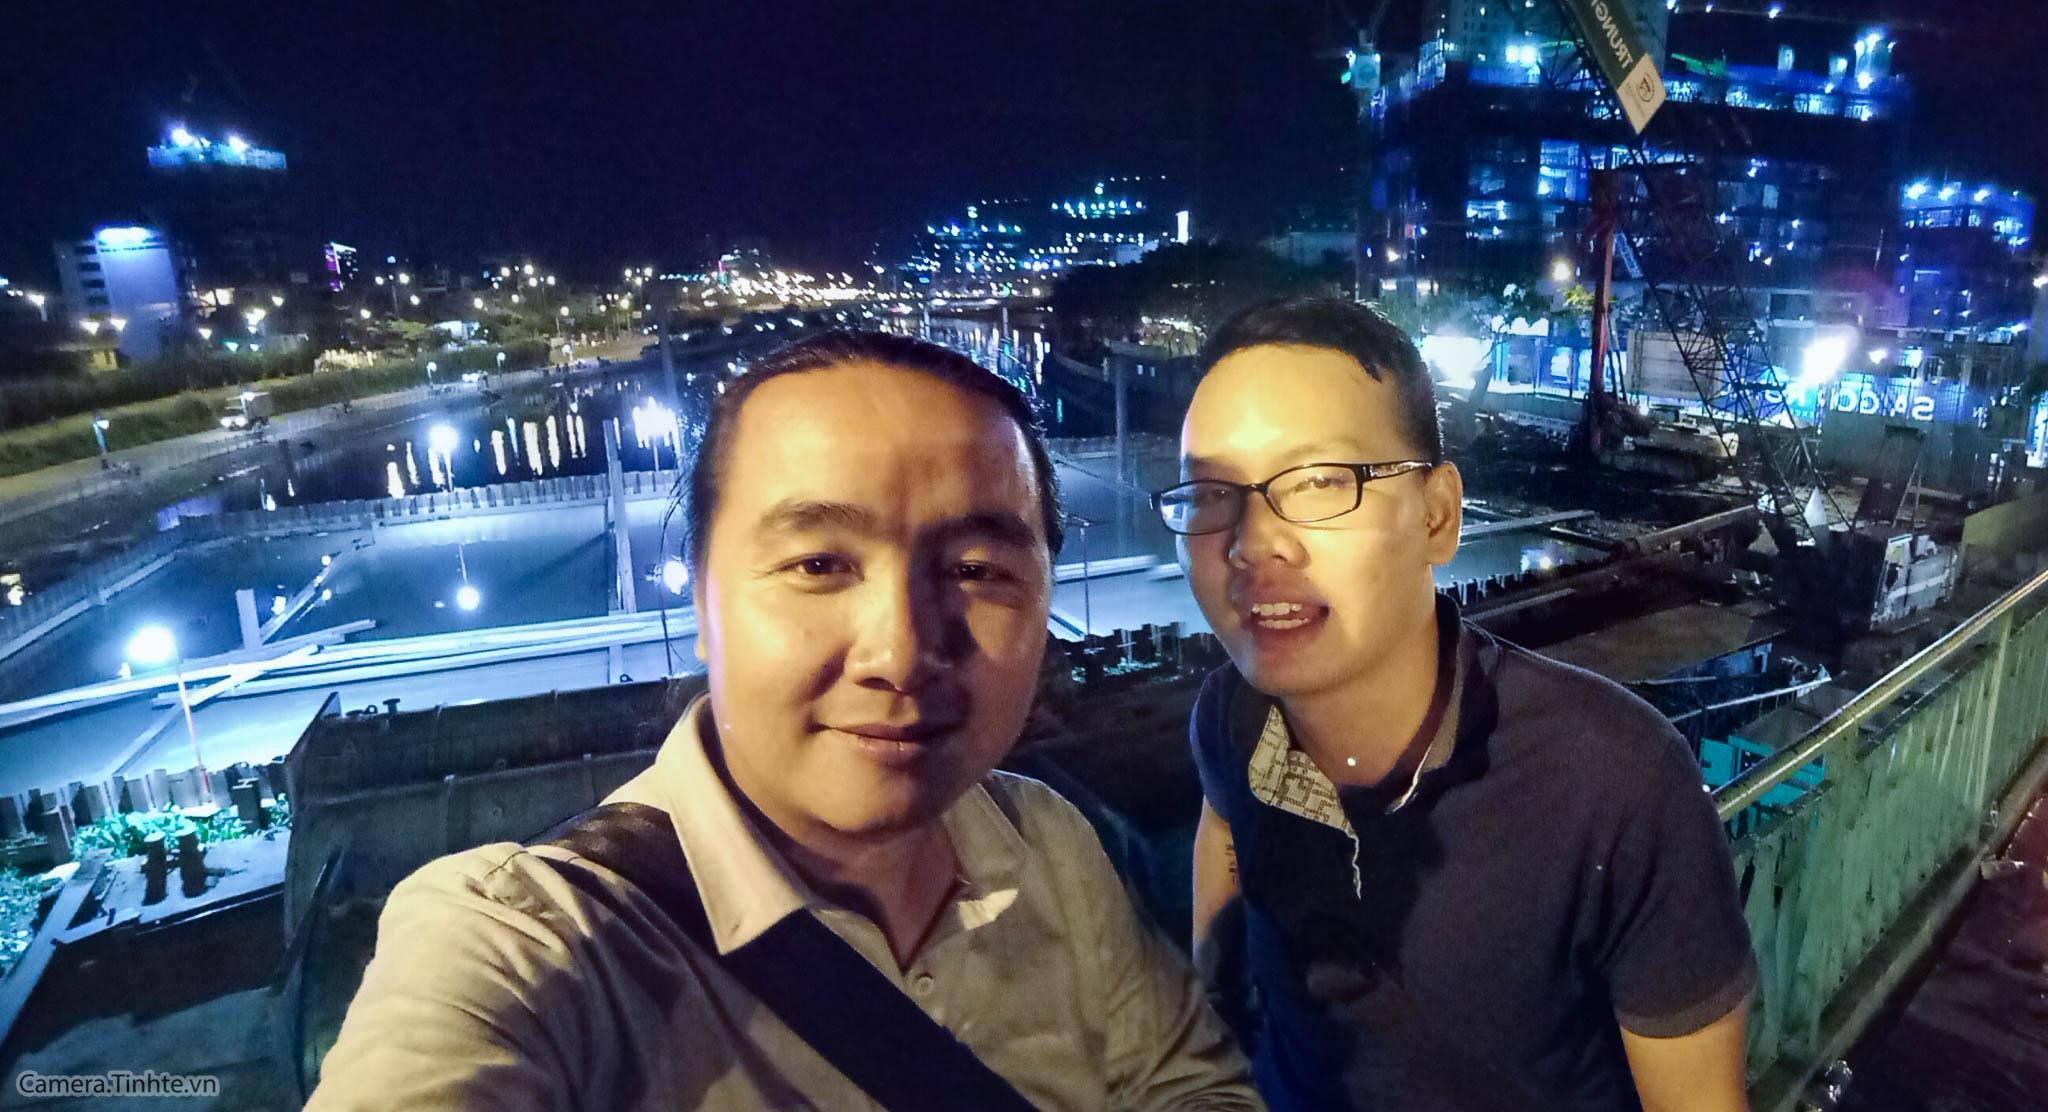 Camera-Tinhte_HTC Desire 10 Pro_IMAG0087.jpg